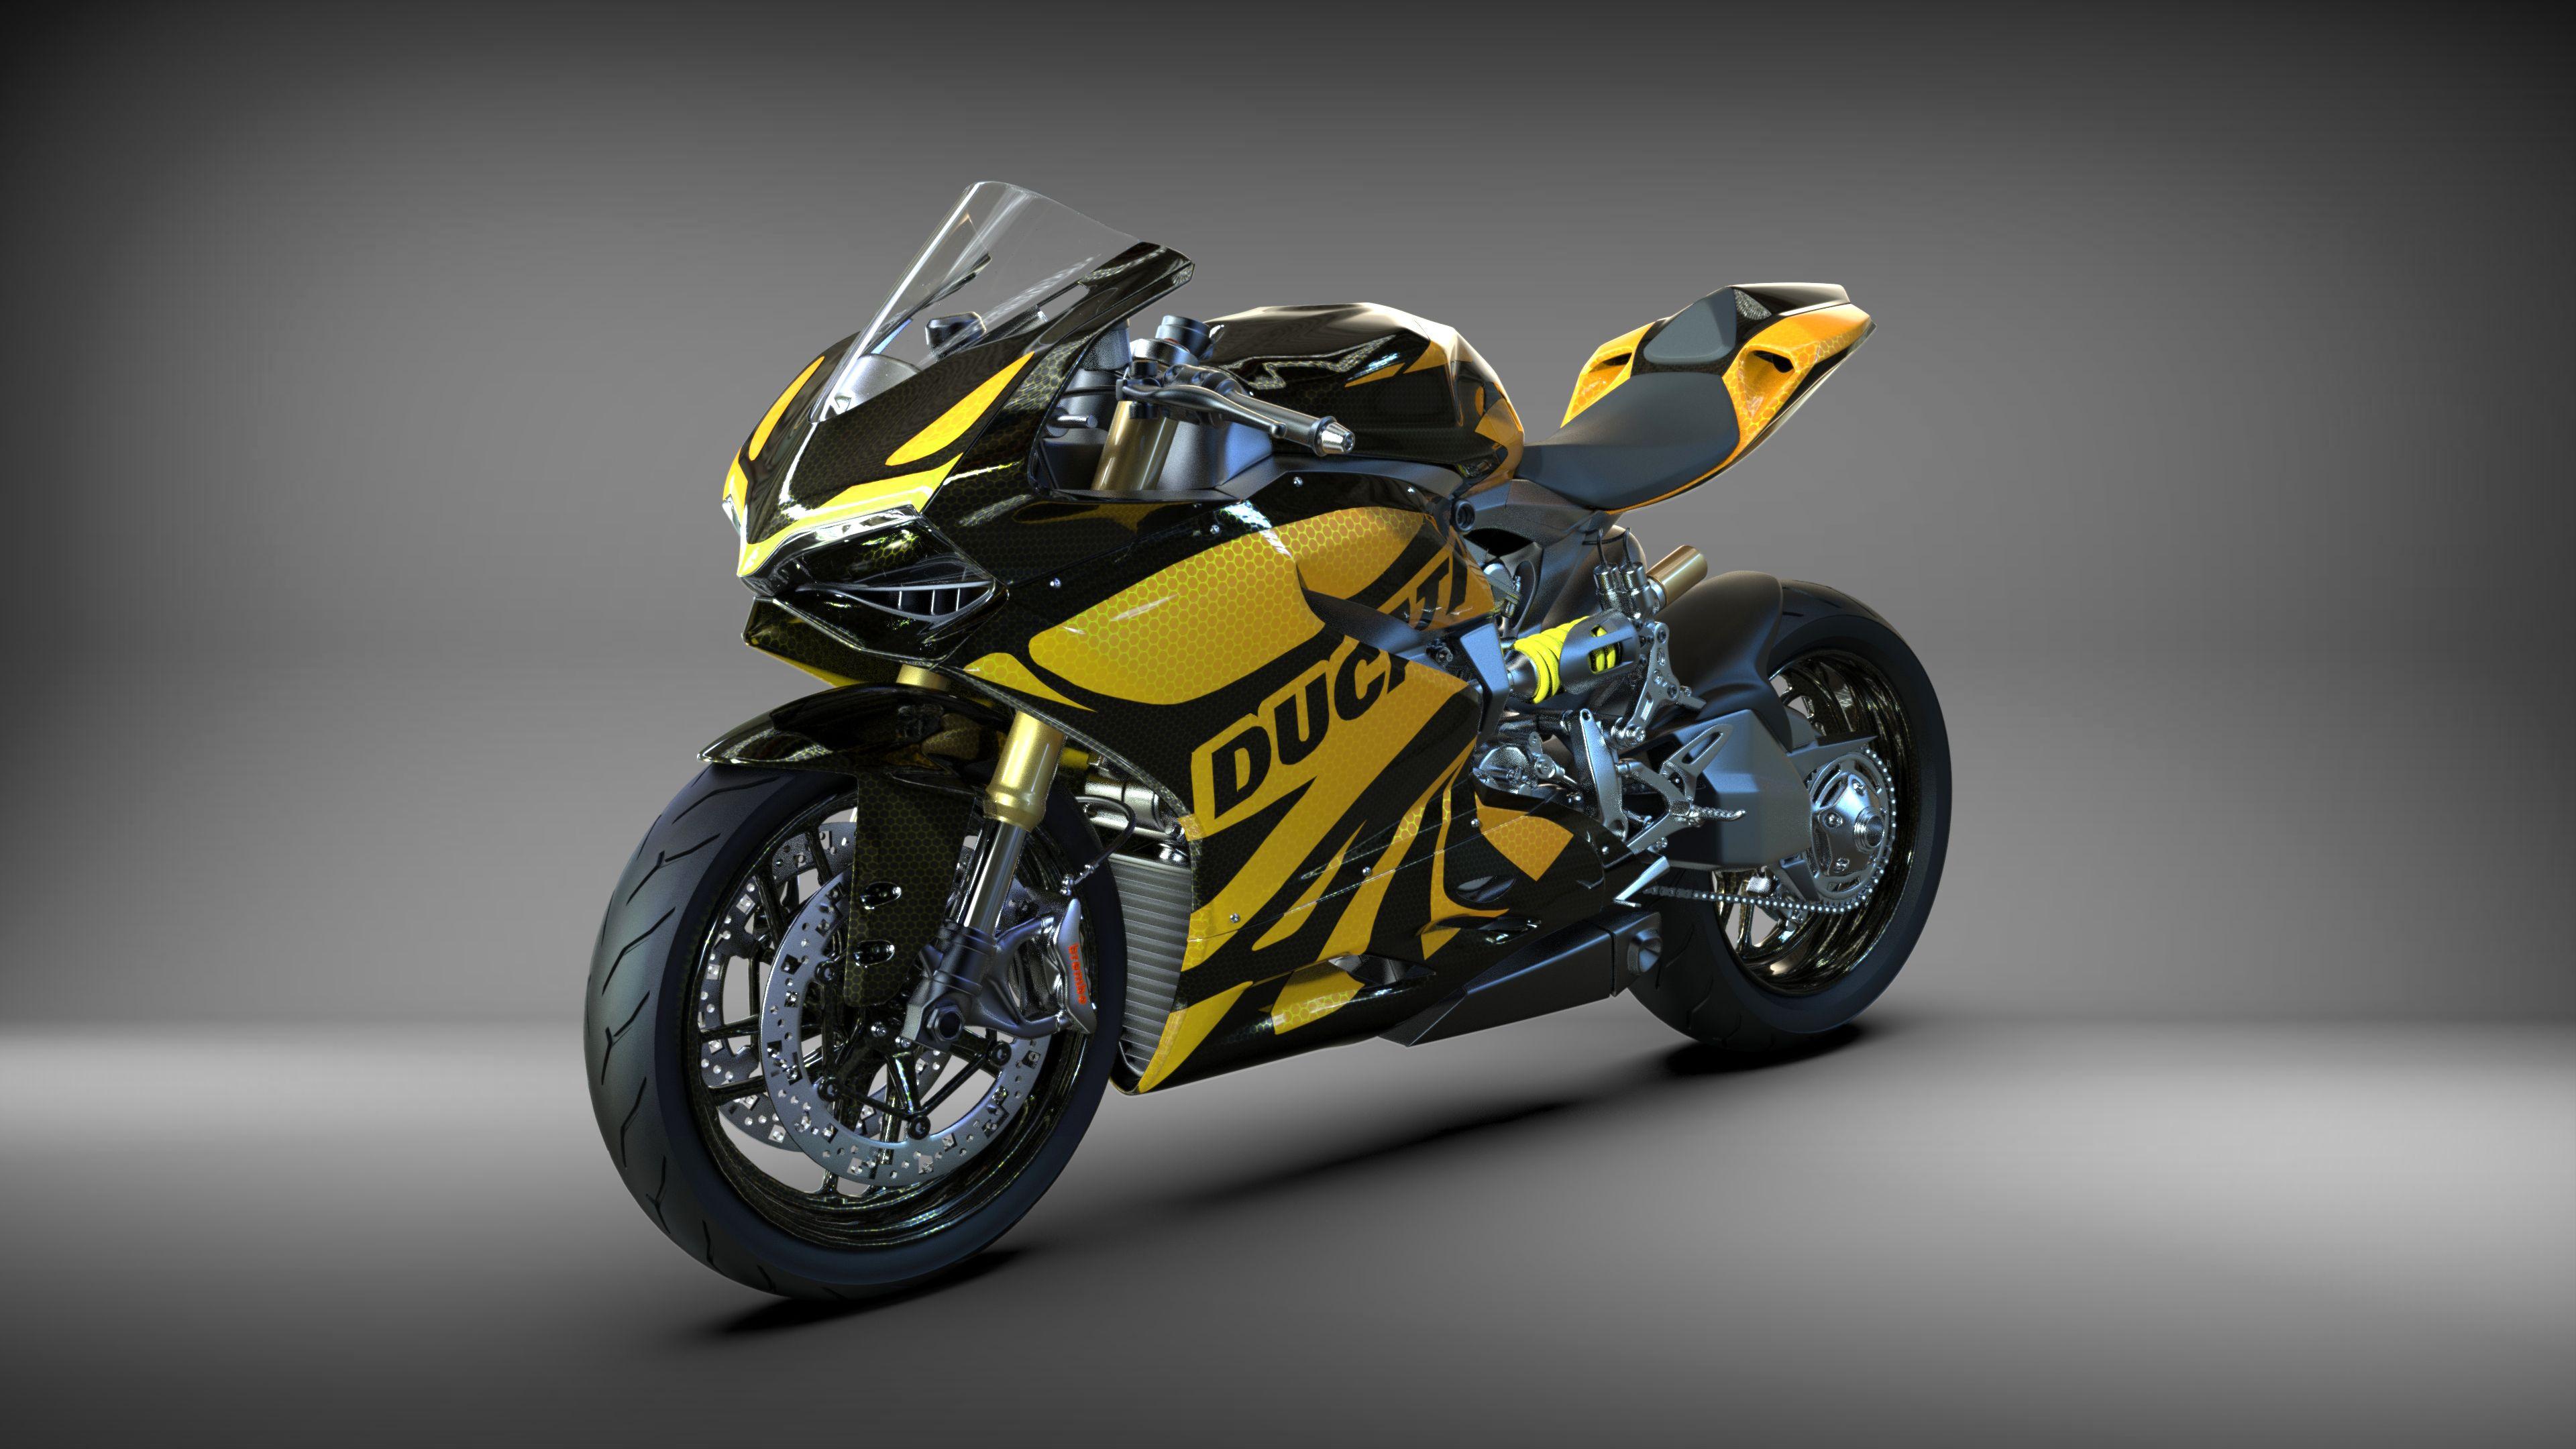 Ducati_Panigale_1199_2012_typeA_001